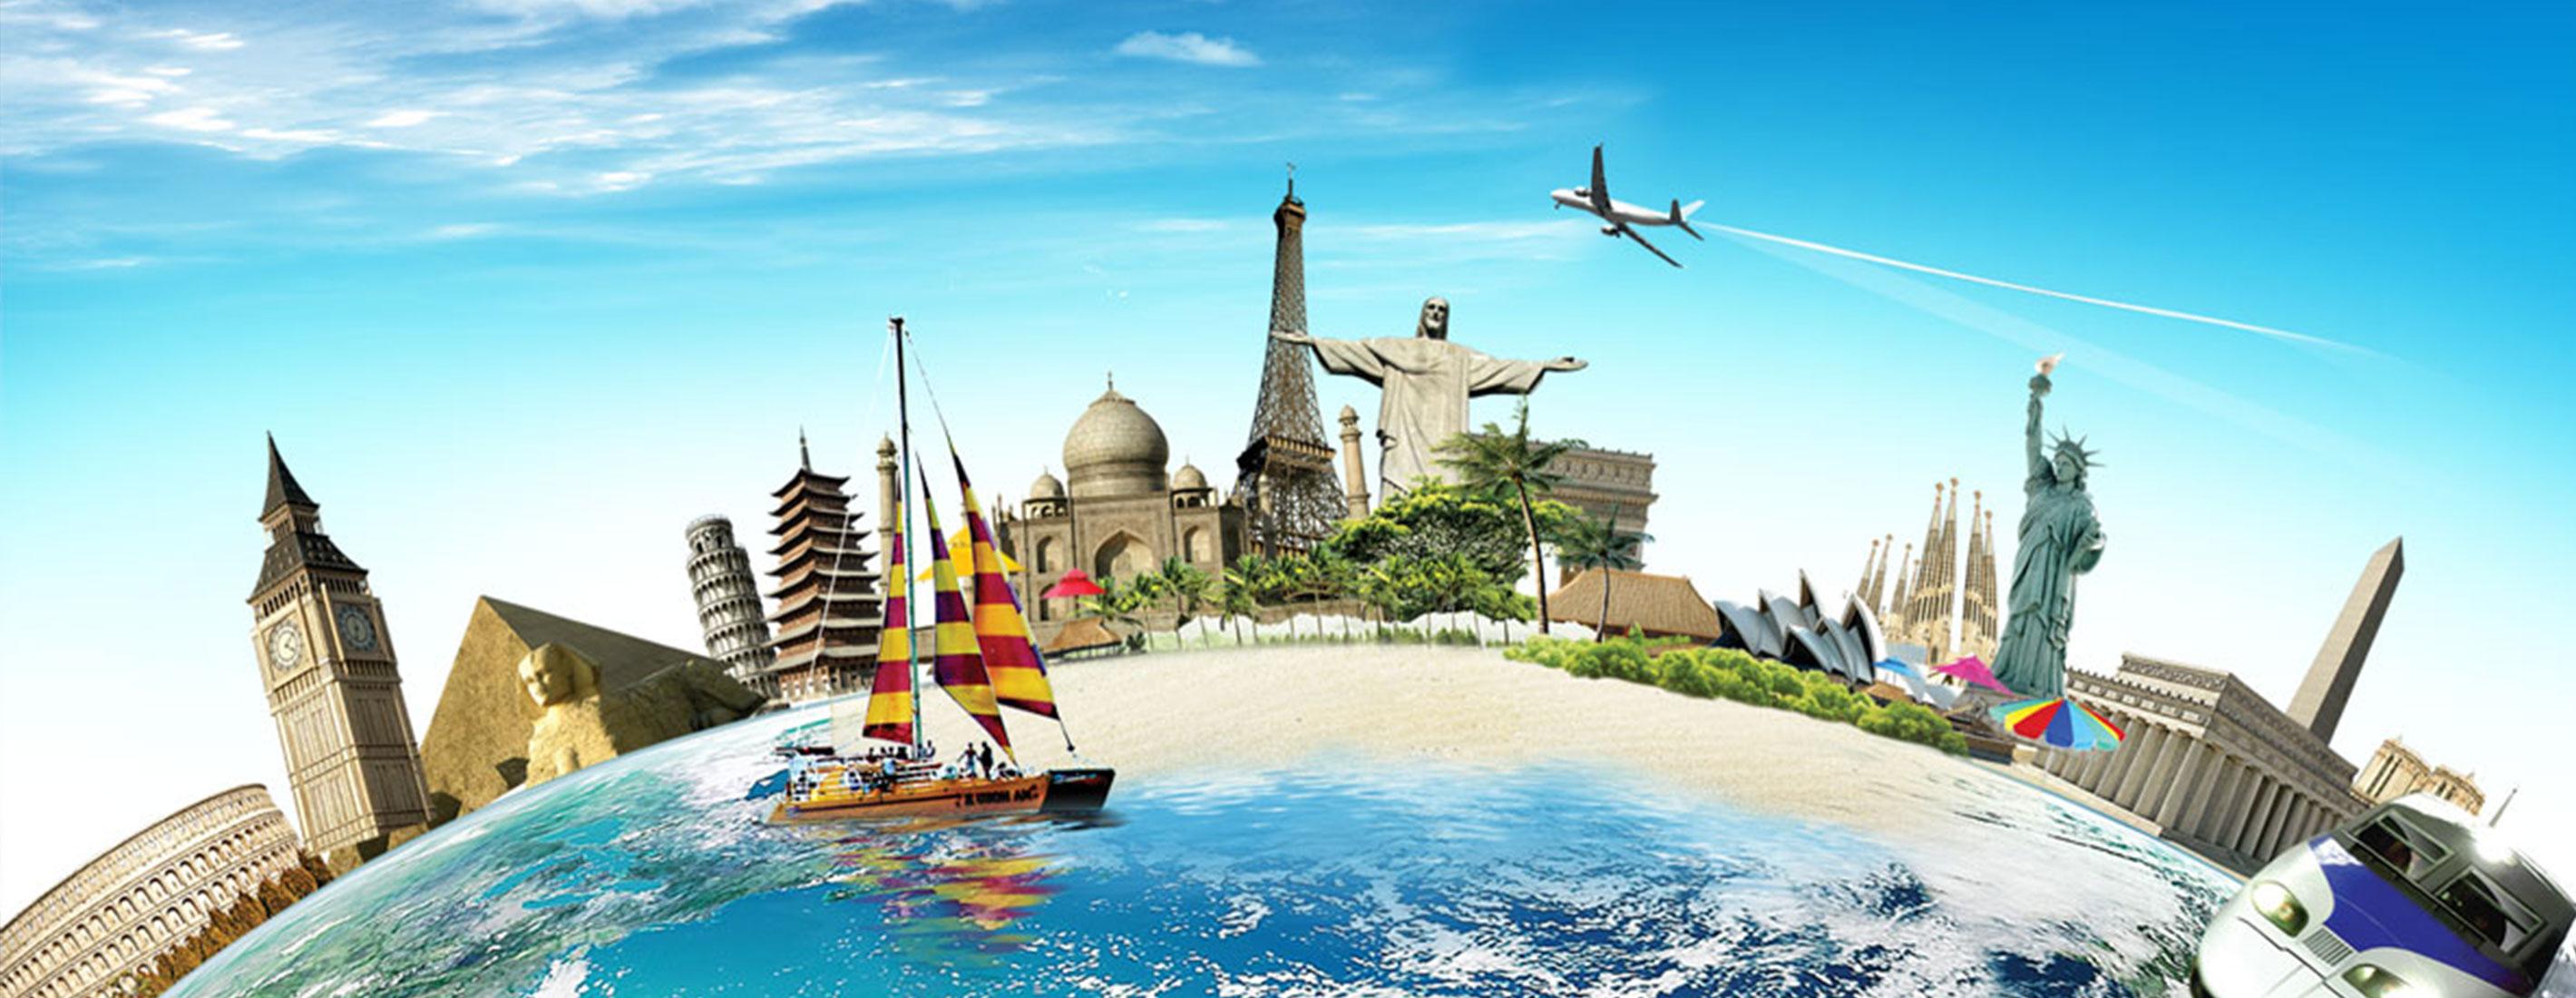 official tourism s thumbnail - HD1156×900